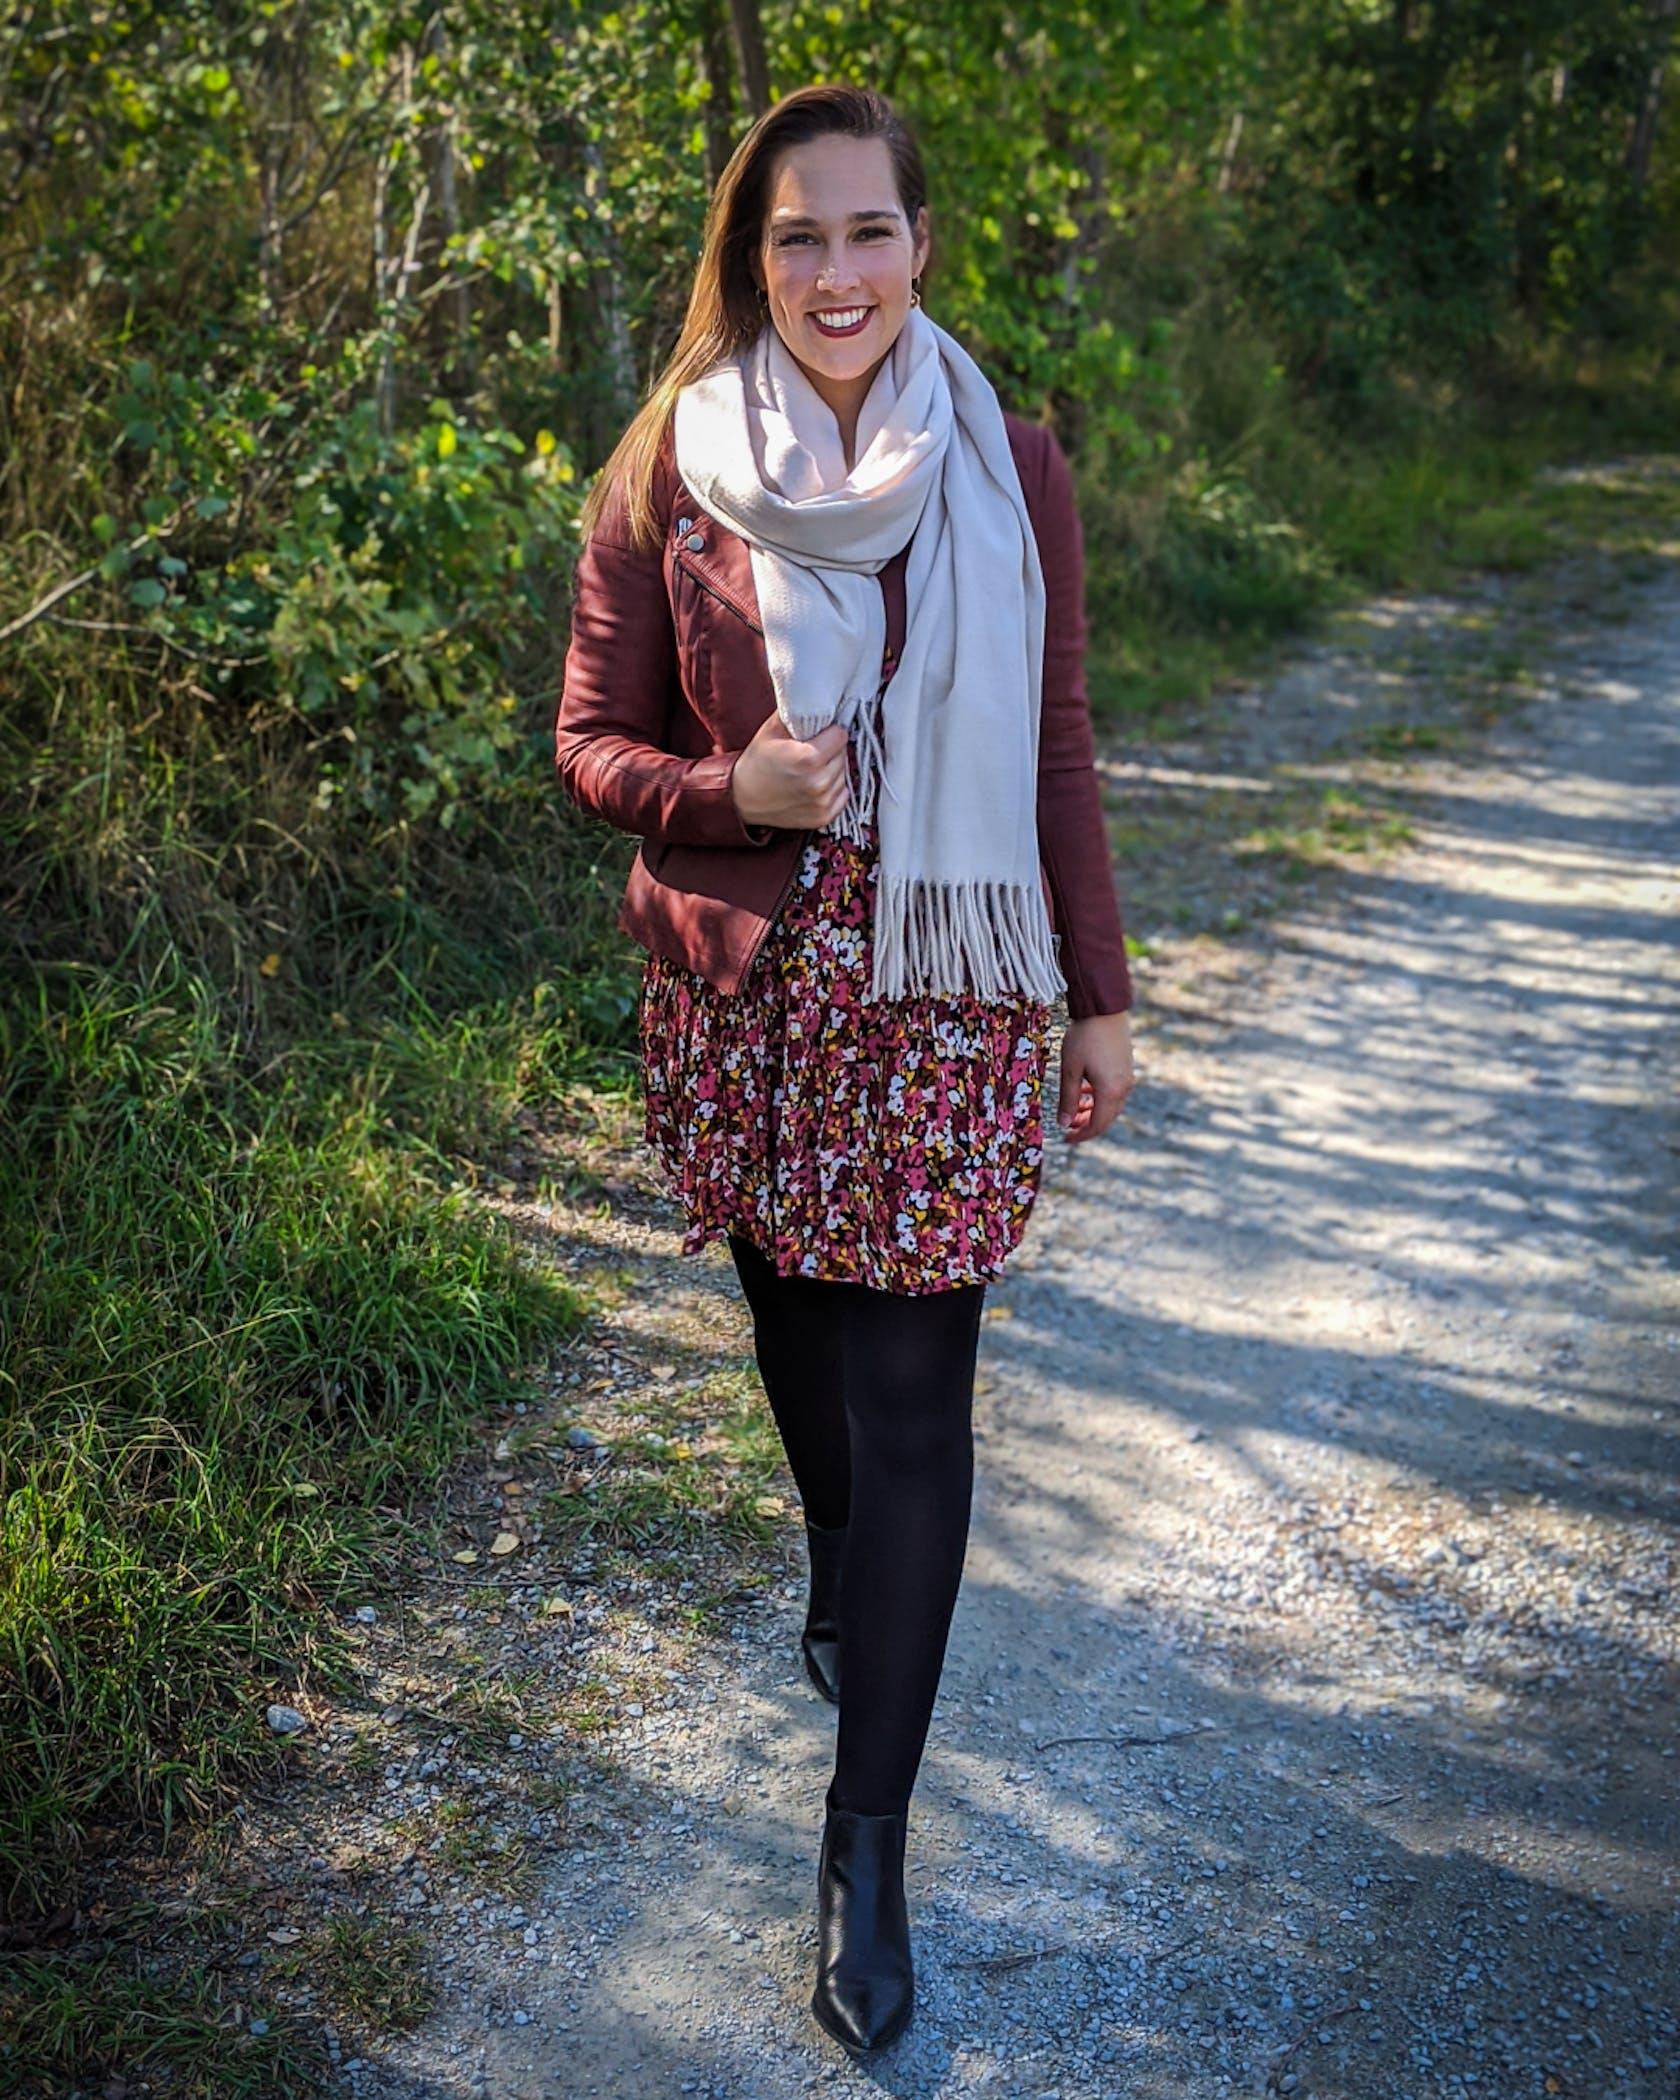 junge Frau in modischem Outfit geht einen Waldweg entlang